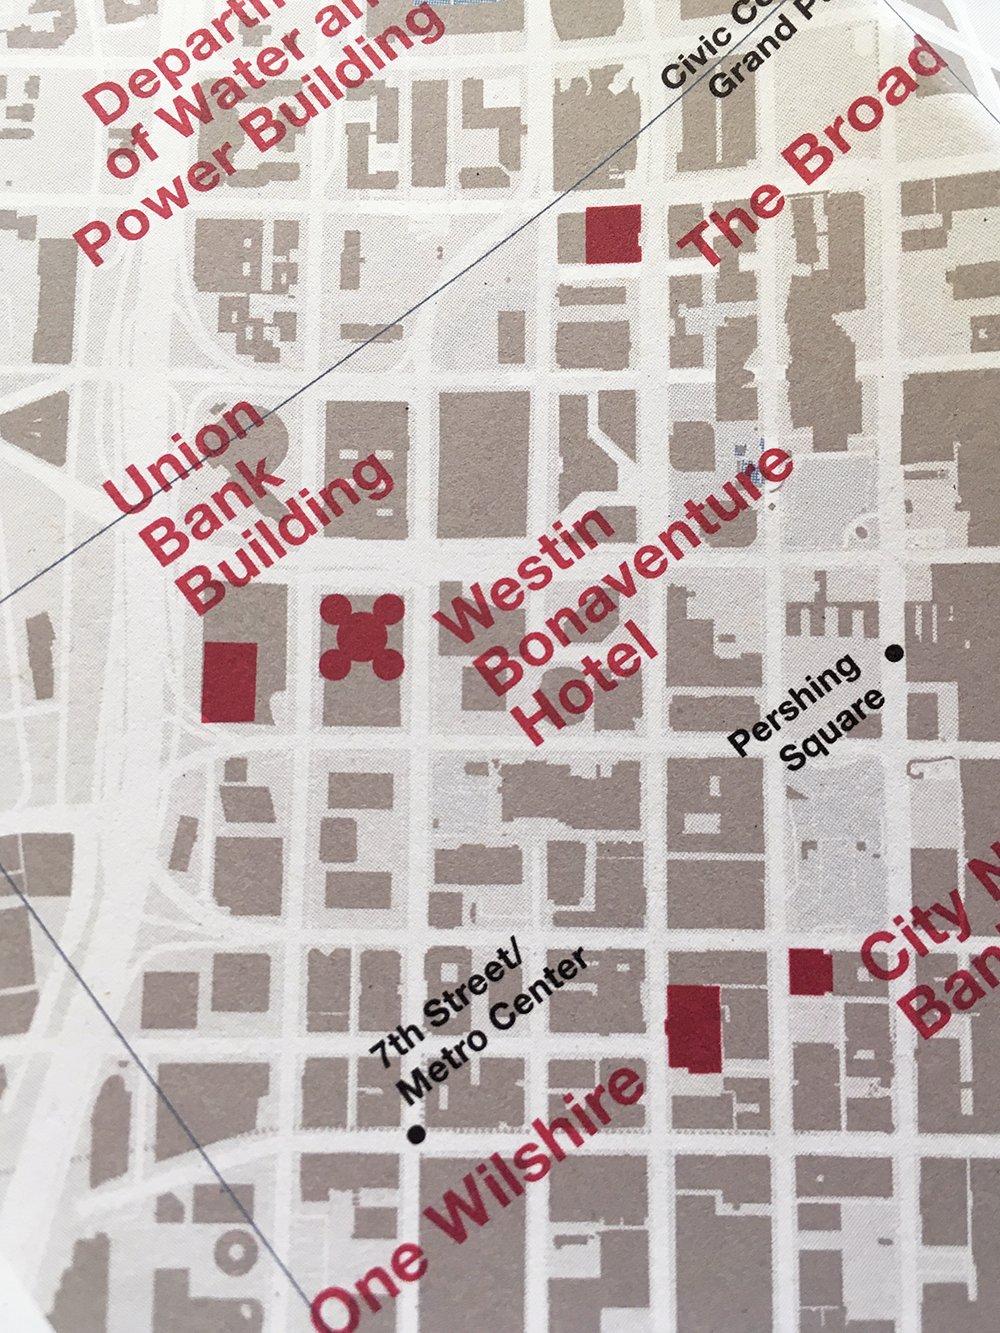 Detail of Concrete Los Angeles Map